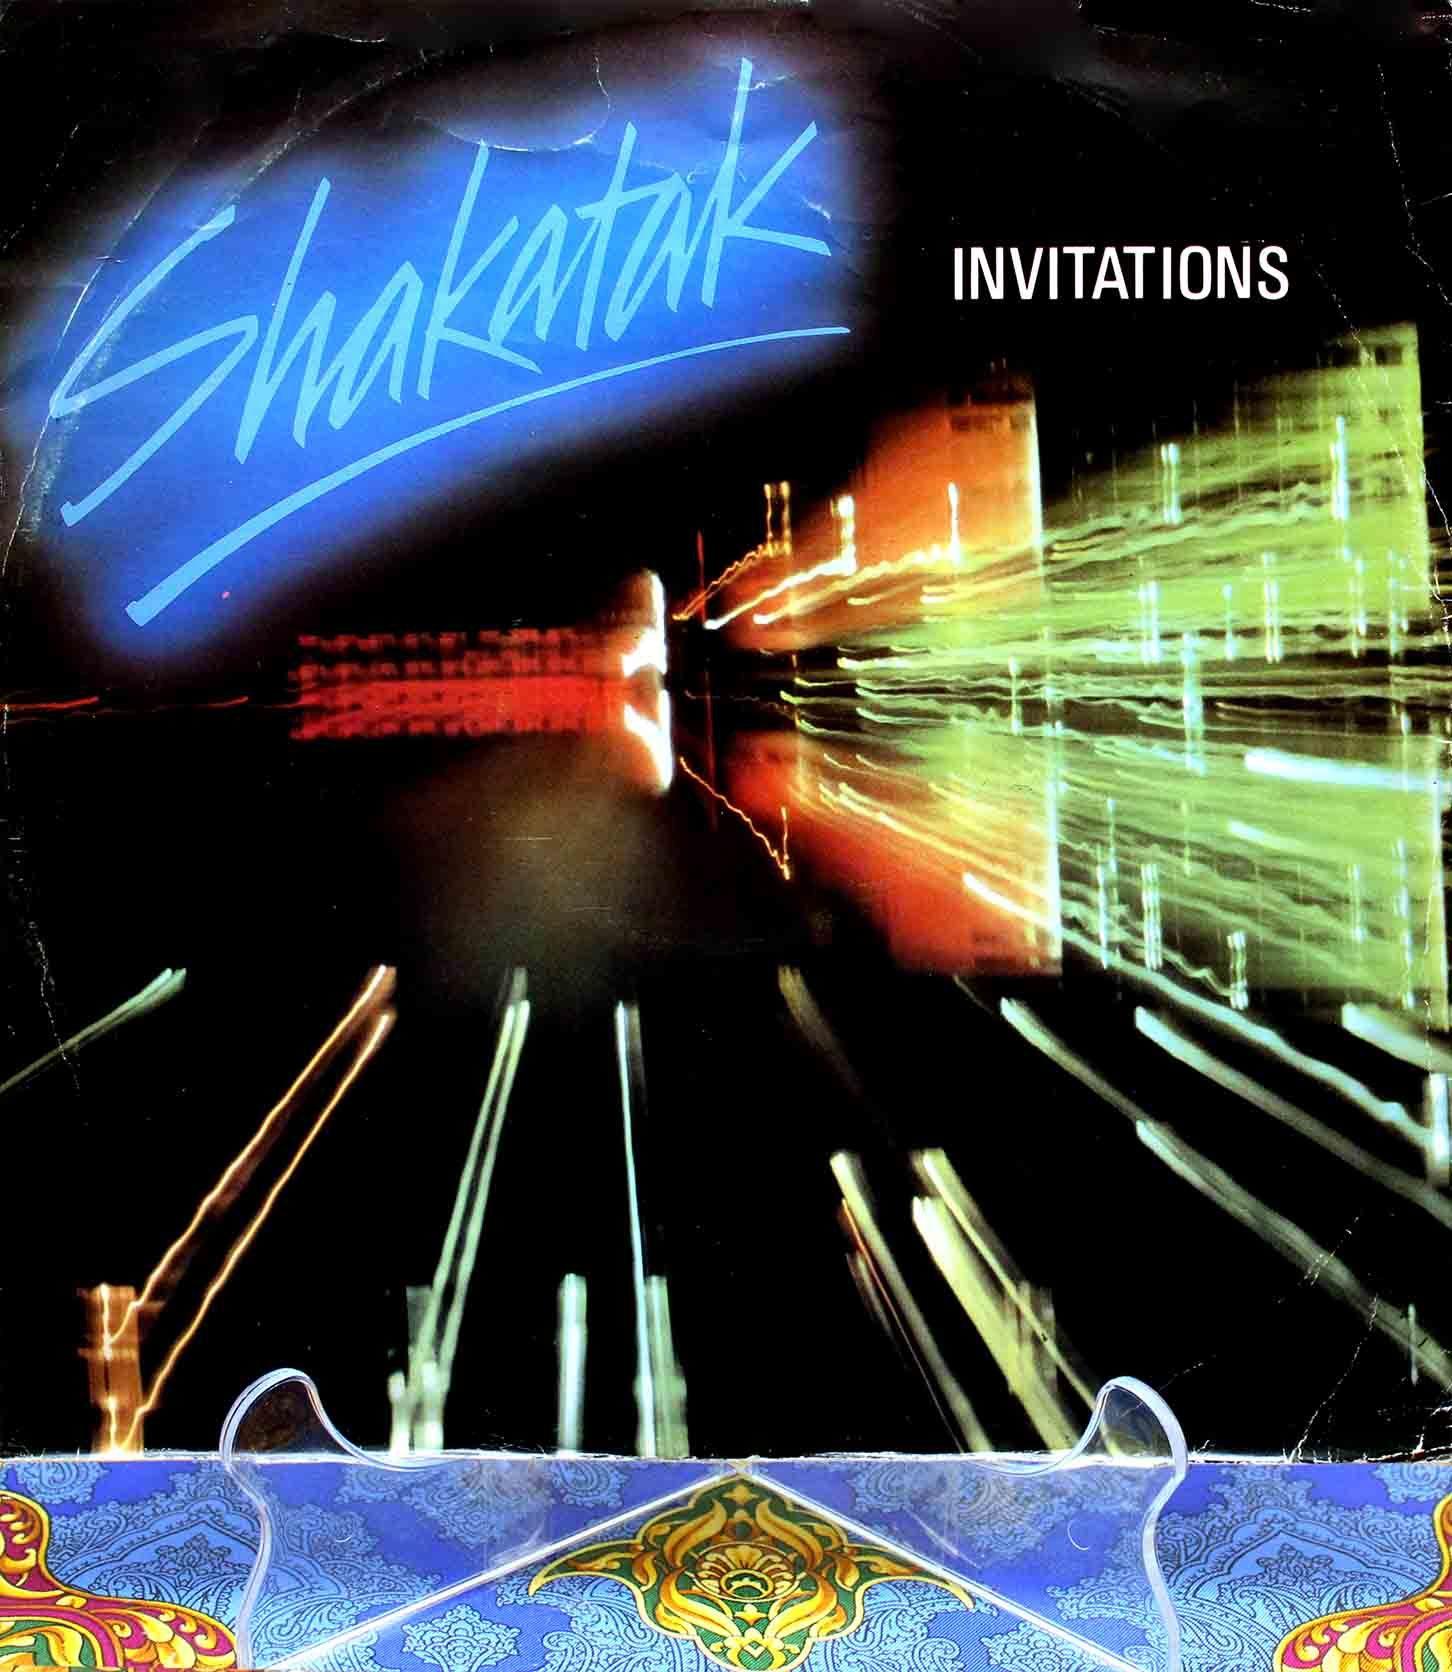 Shakatak – Invitations 01